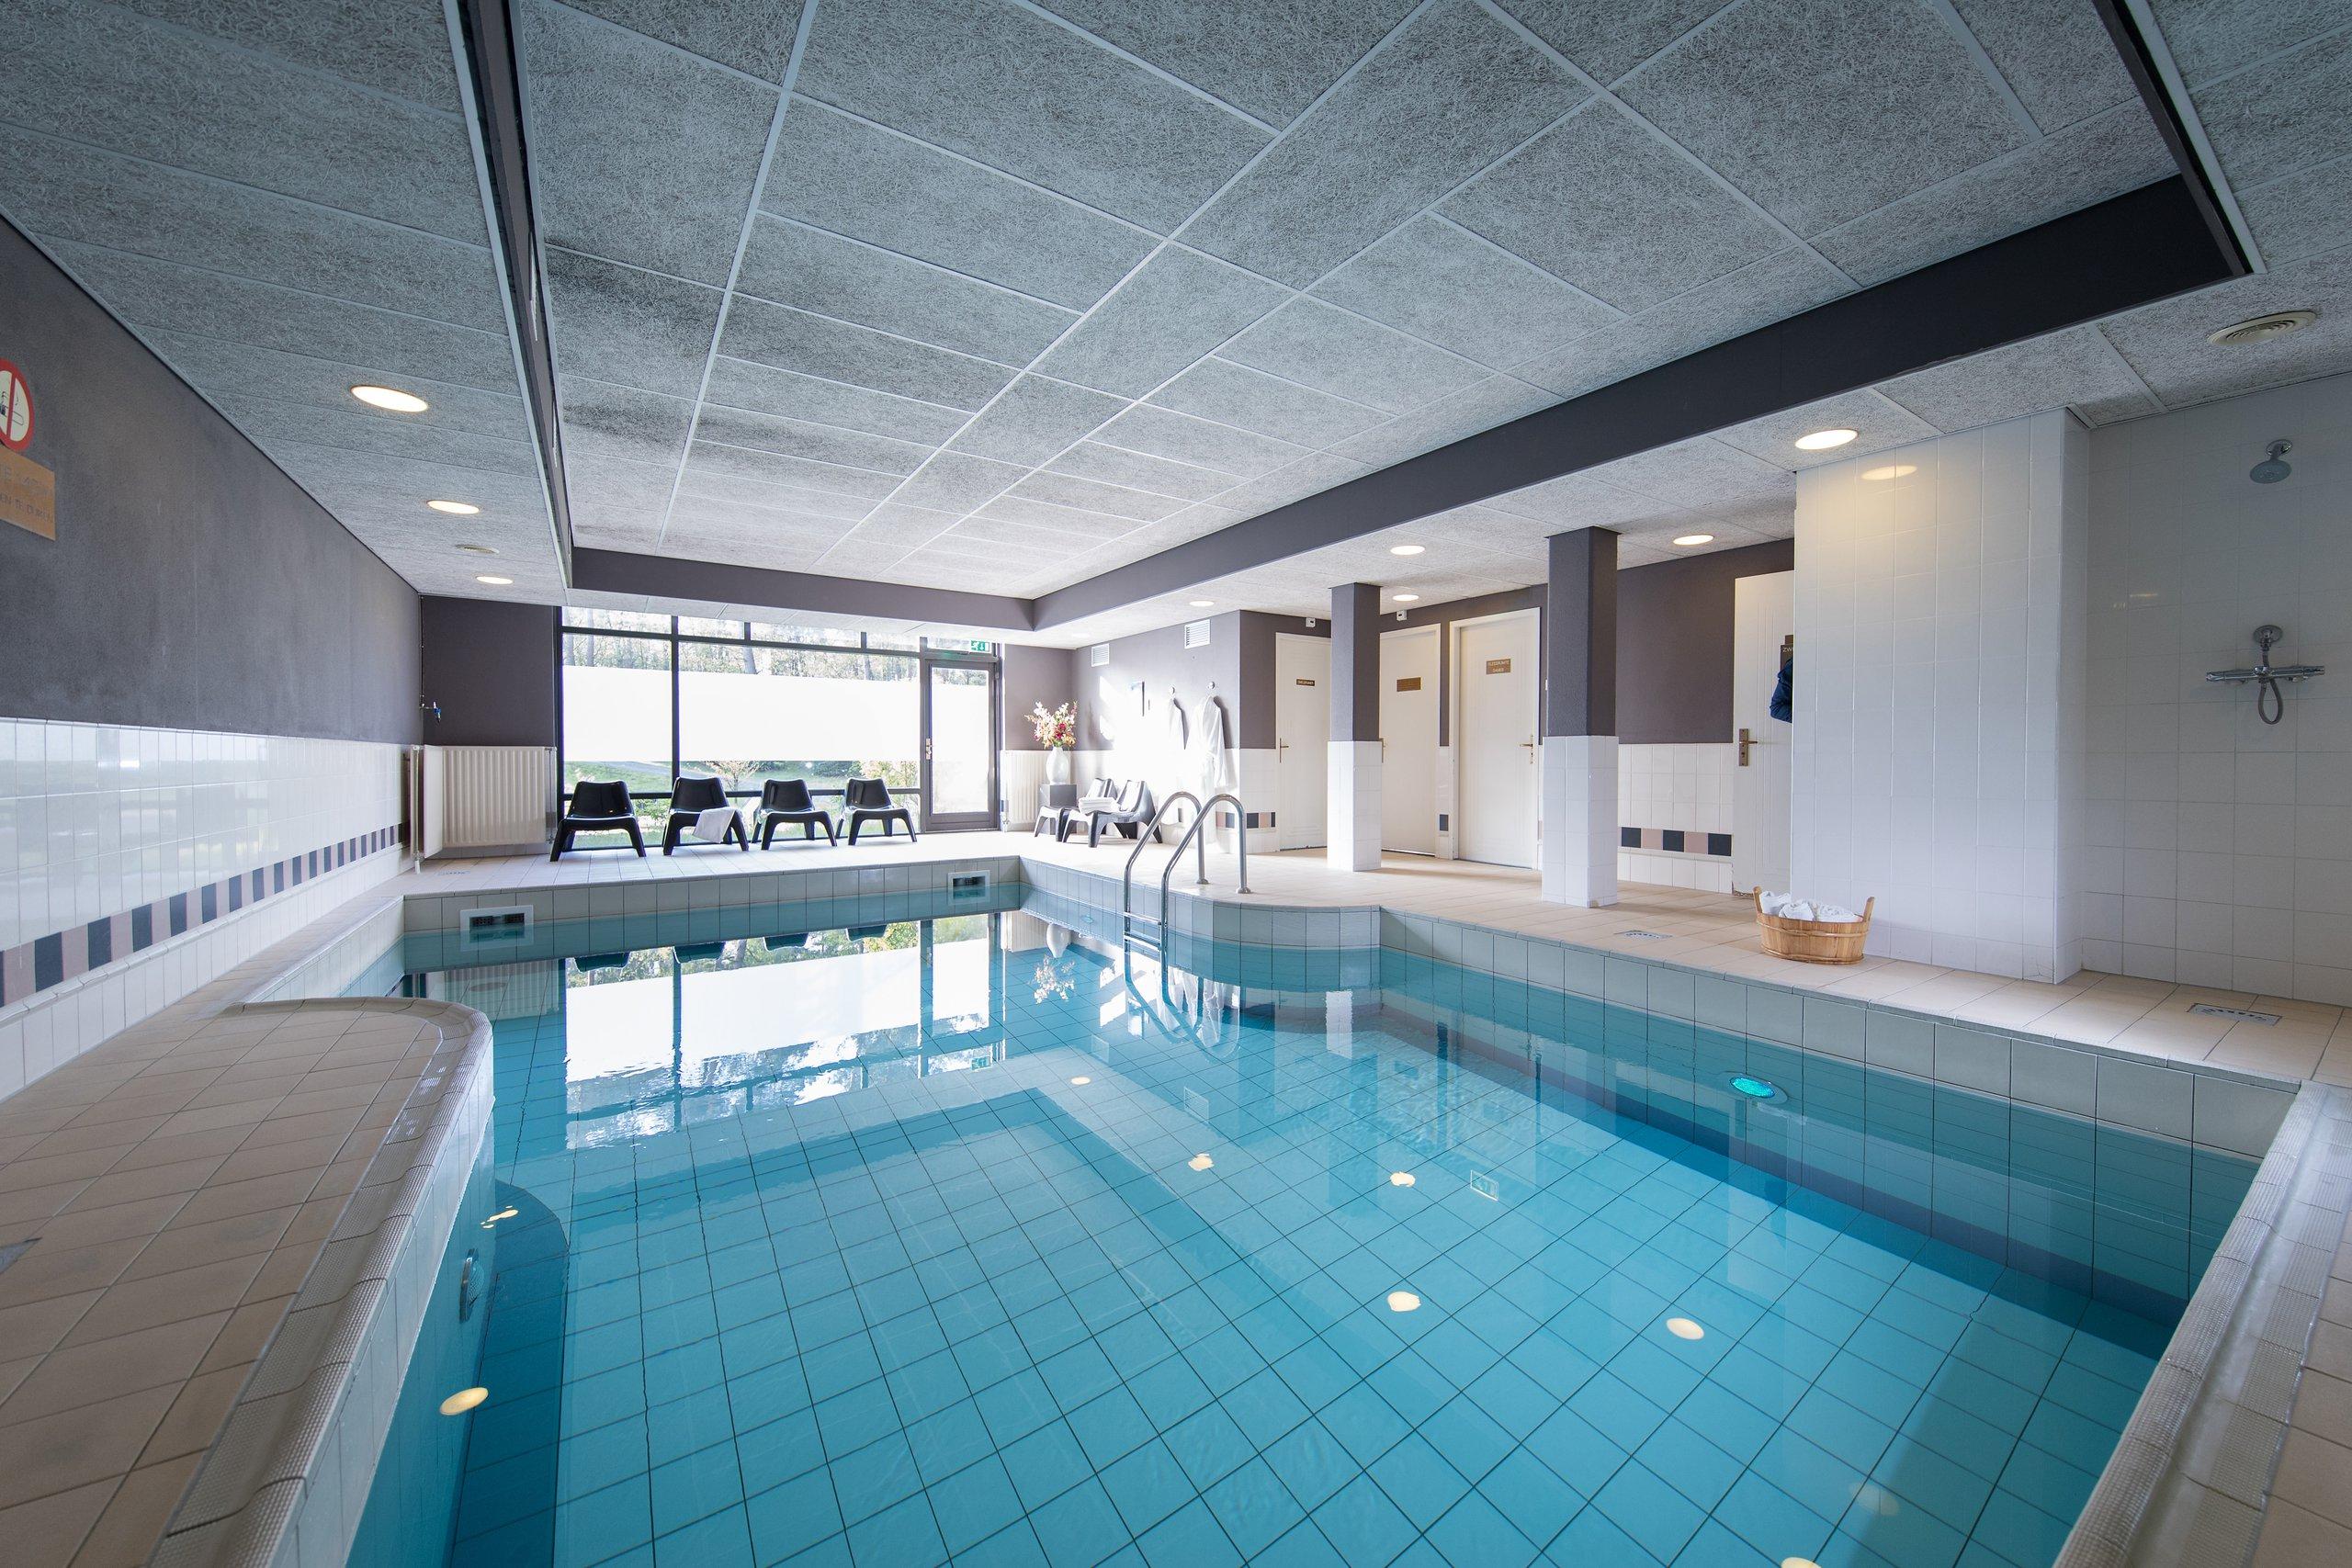 Design Badkamers Utrecht : Hotel résidence groot heideborgh bilderberg hotels